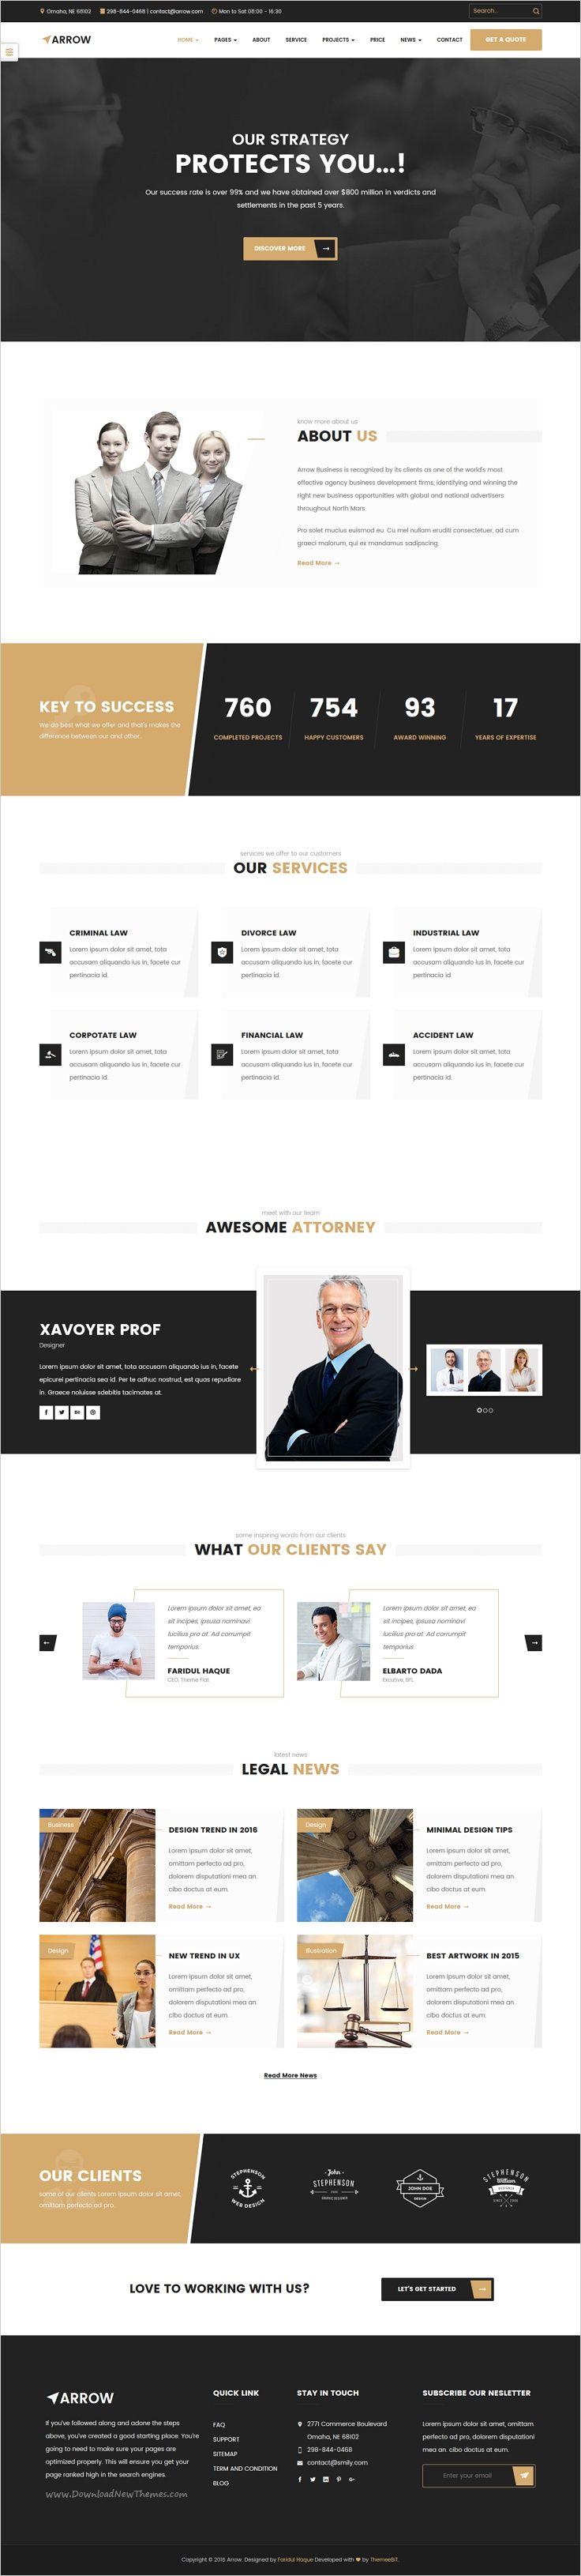 The 25 best Lawyer website ideas on Pinterest Law firm website